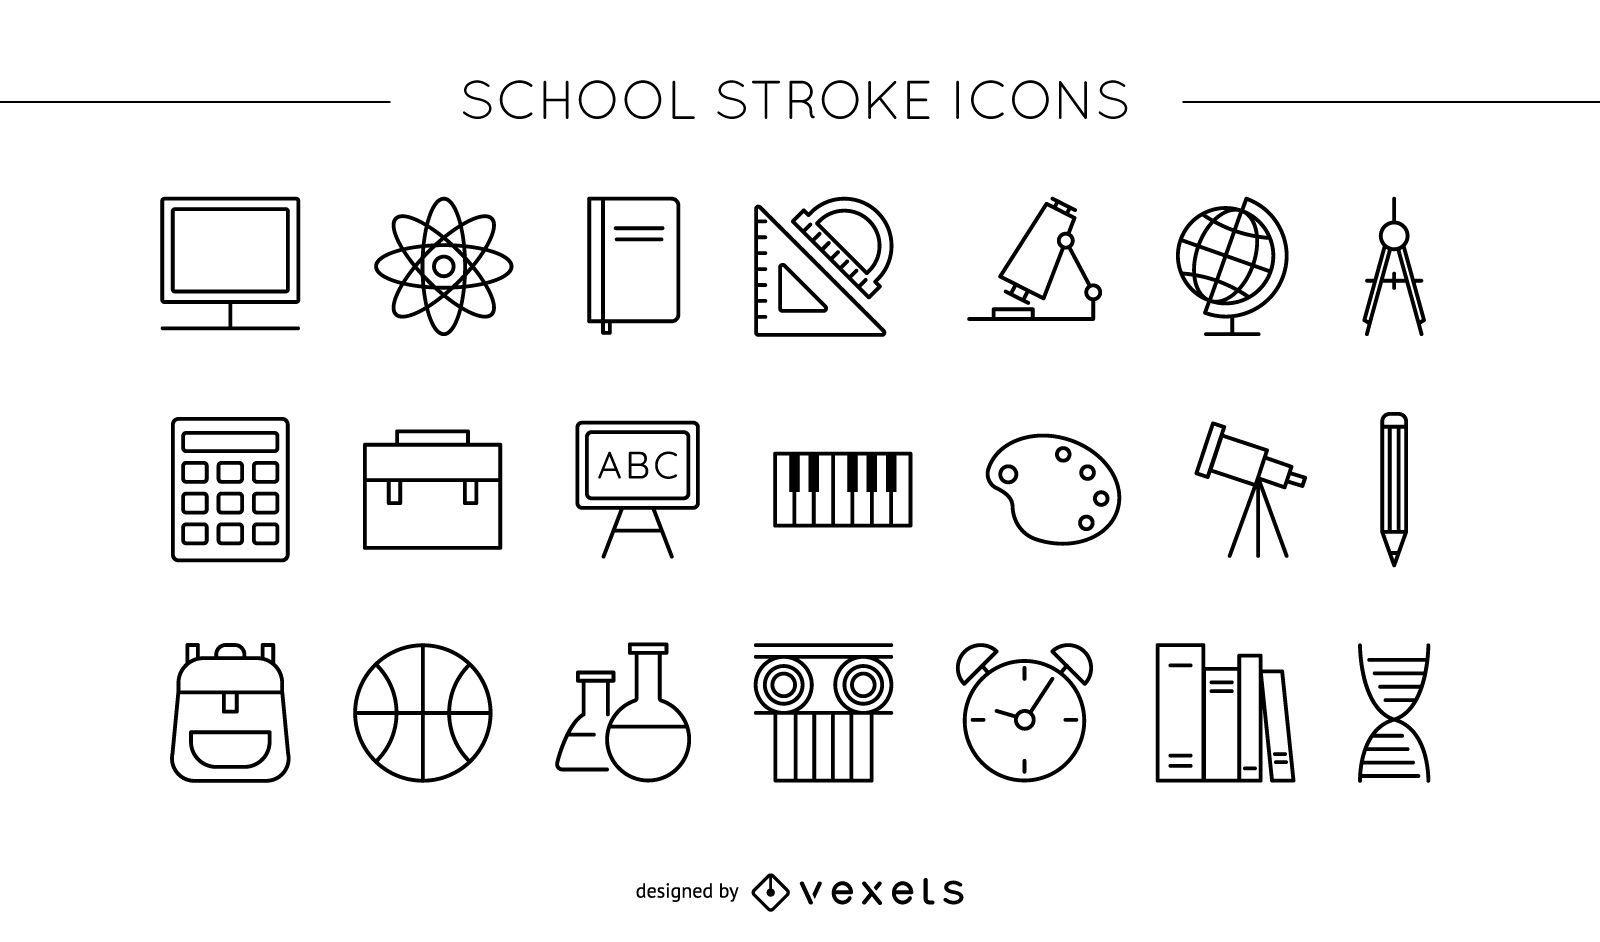 School stroke icon set